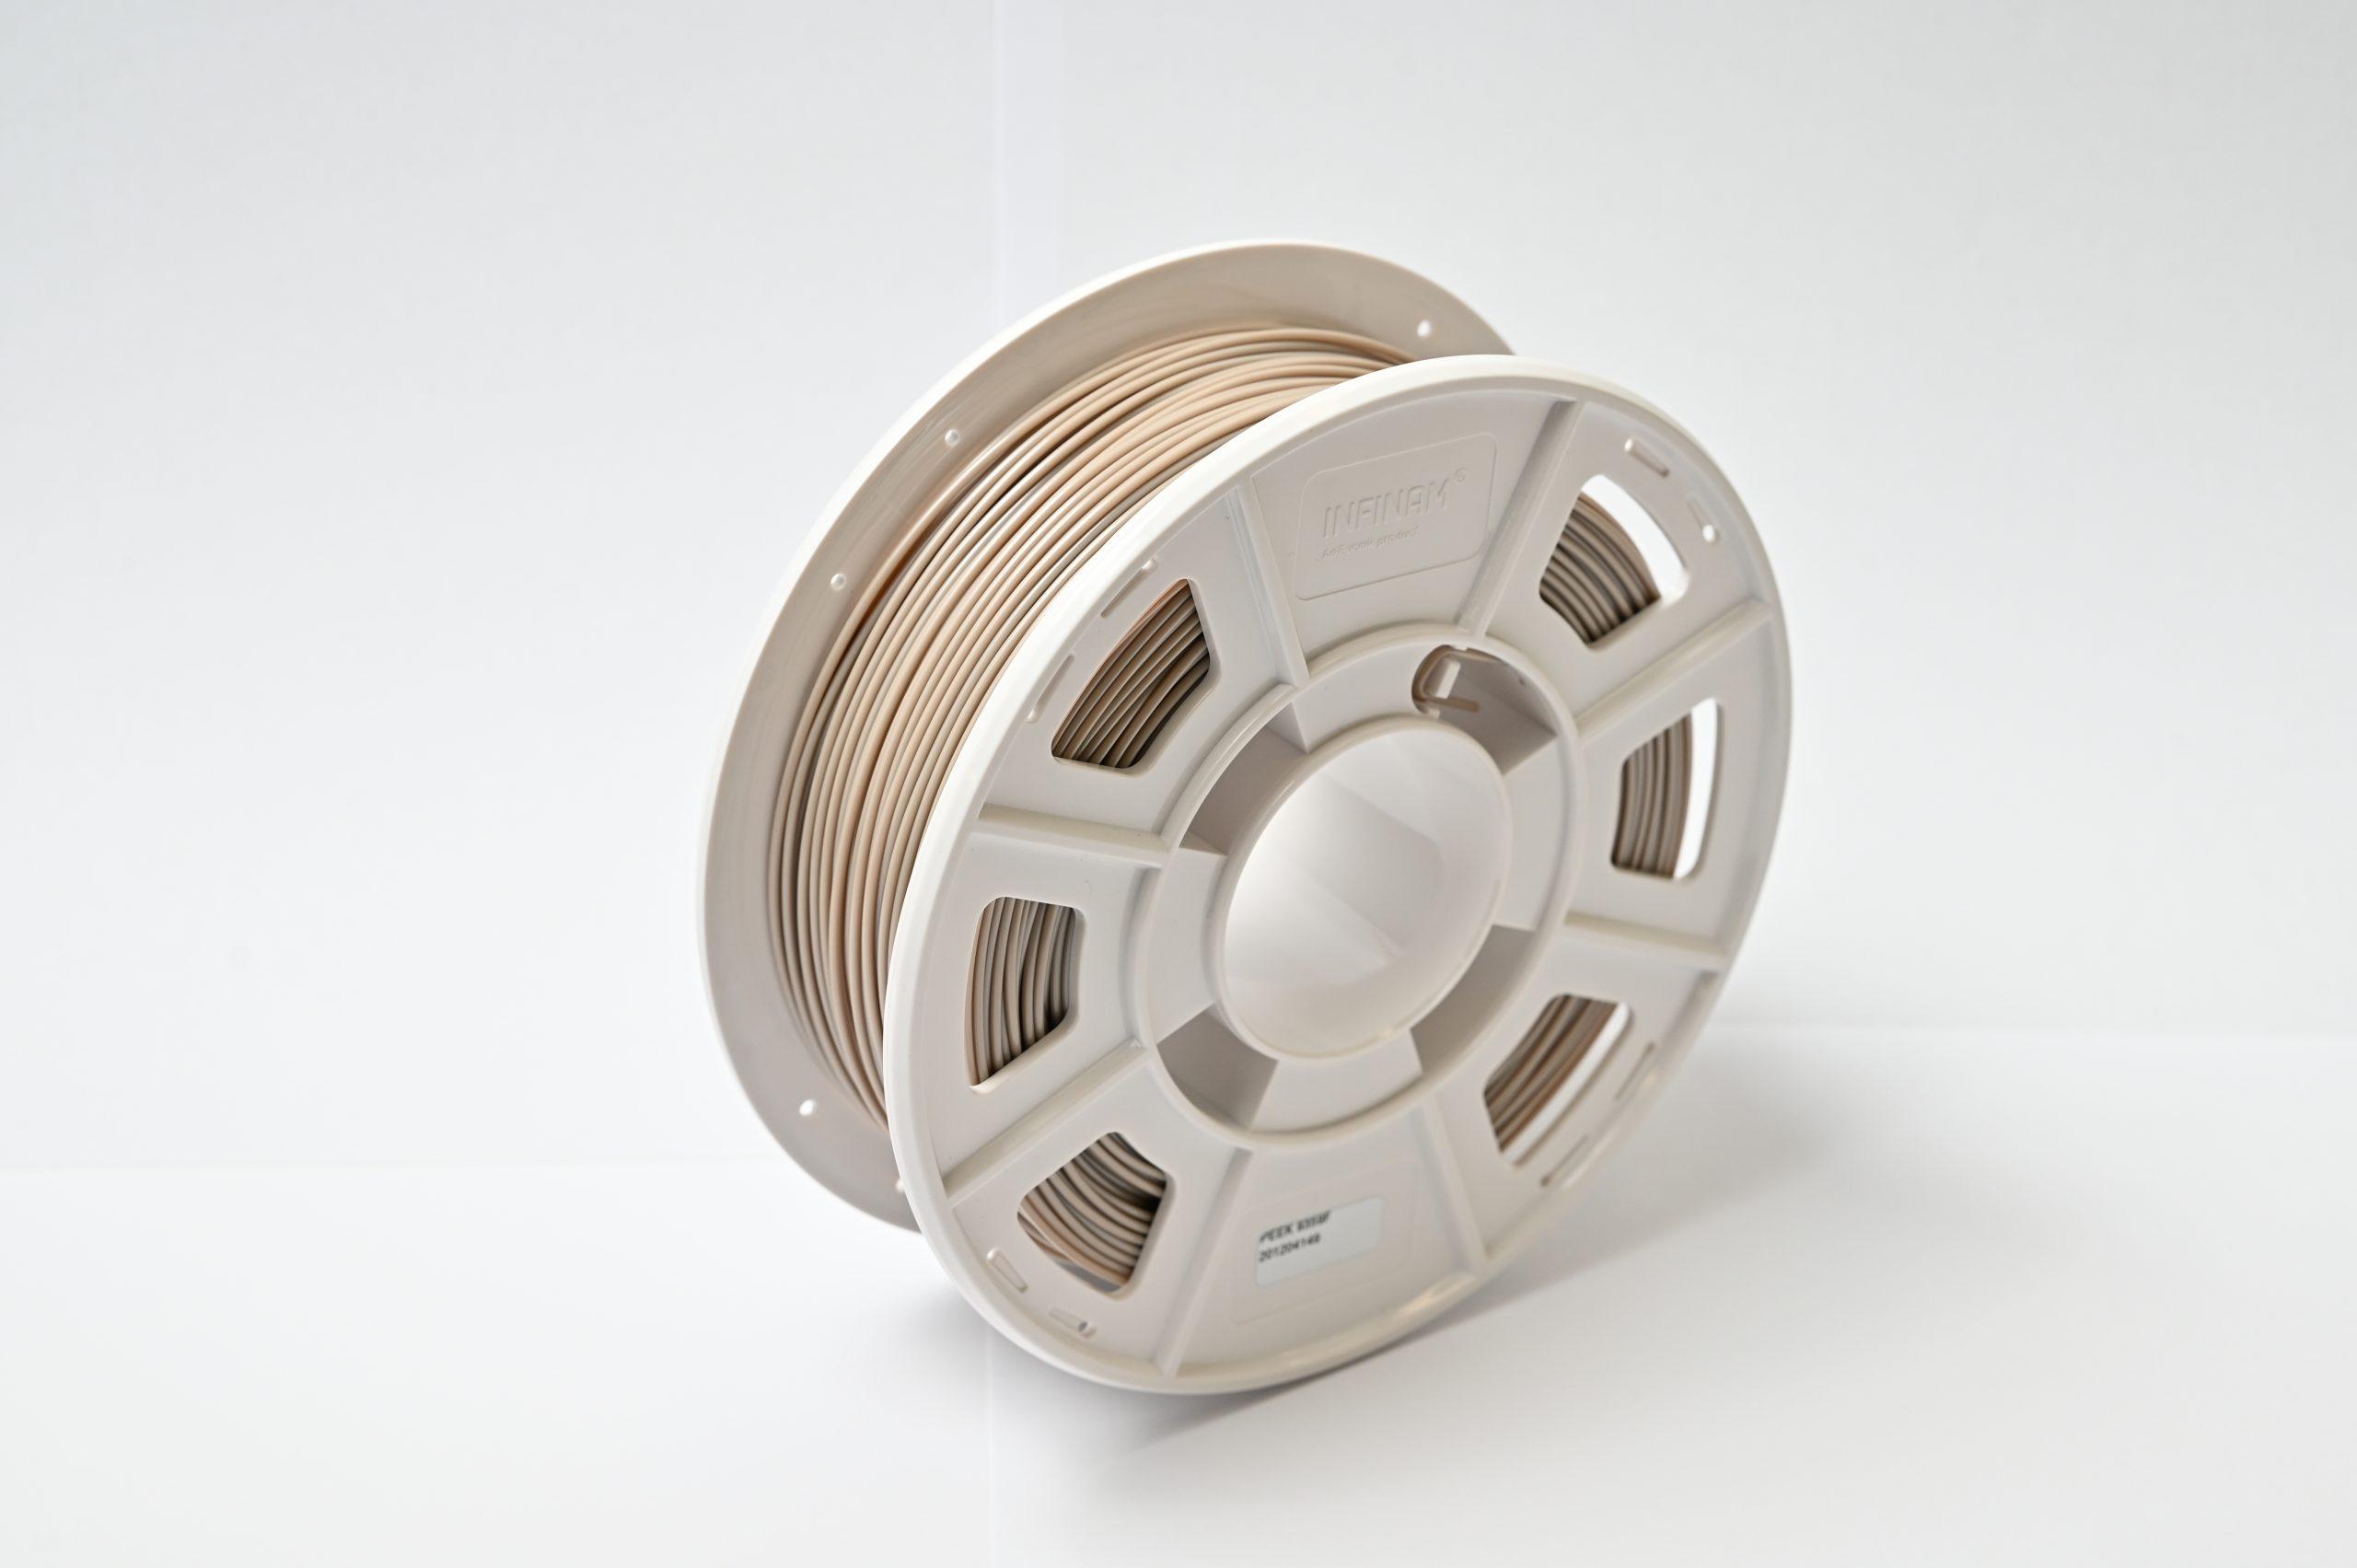 INFINAM PEEK 9359 F filament spool. Photo via Evonik.